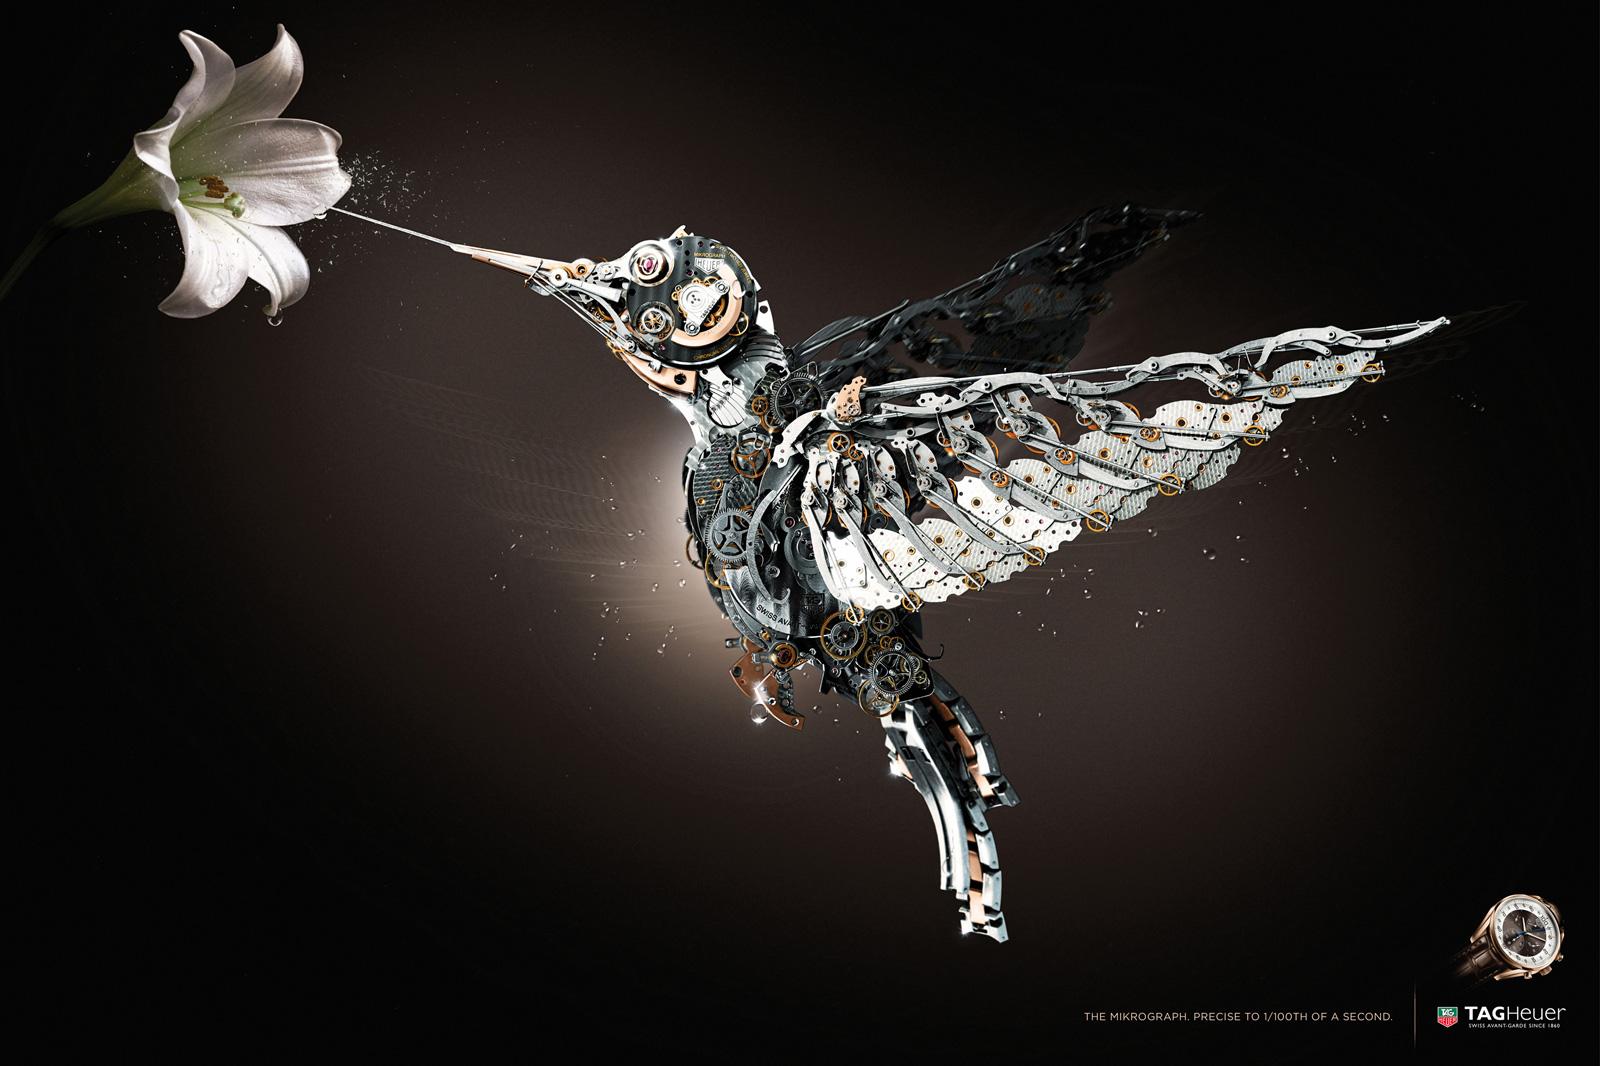 Tag-Heuer-bird-print.jpg